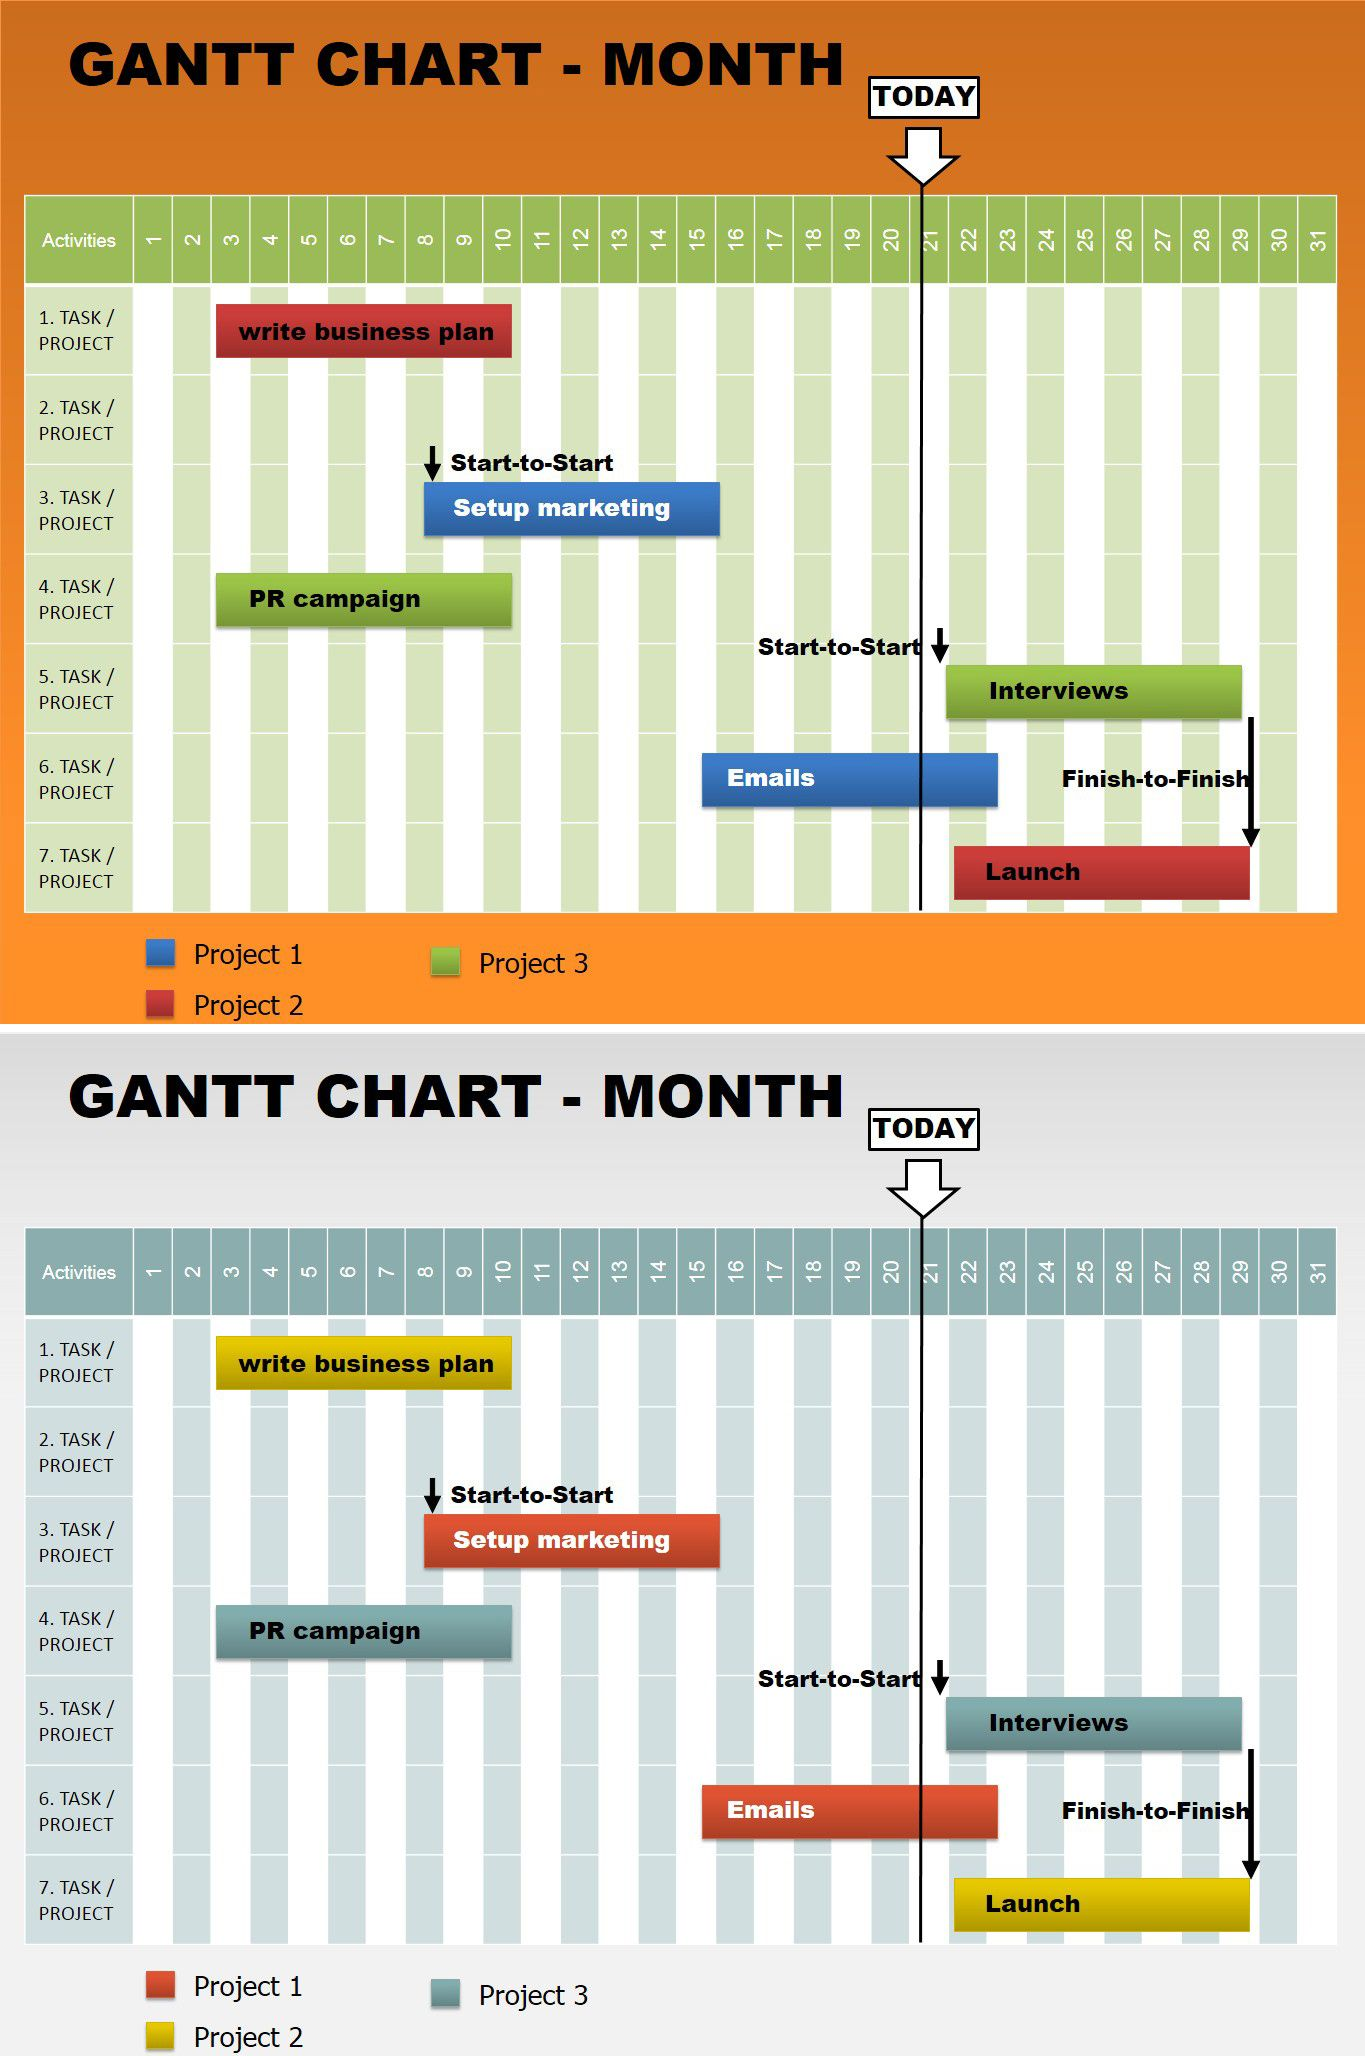 download month gantt free powerpoint charts | free powerpoint, Powerpoint templates